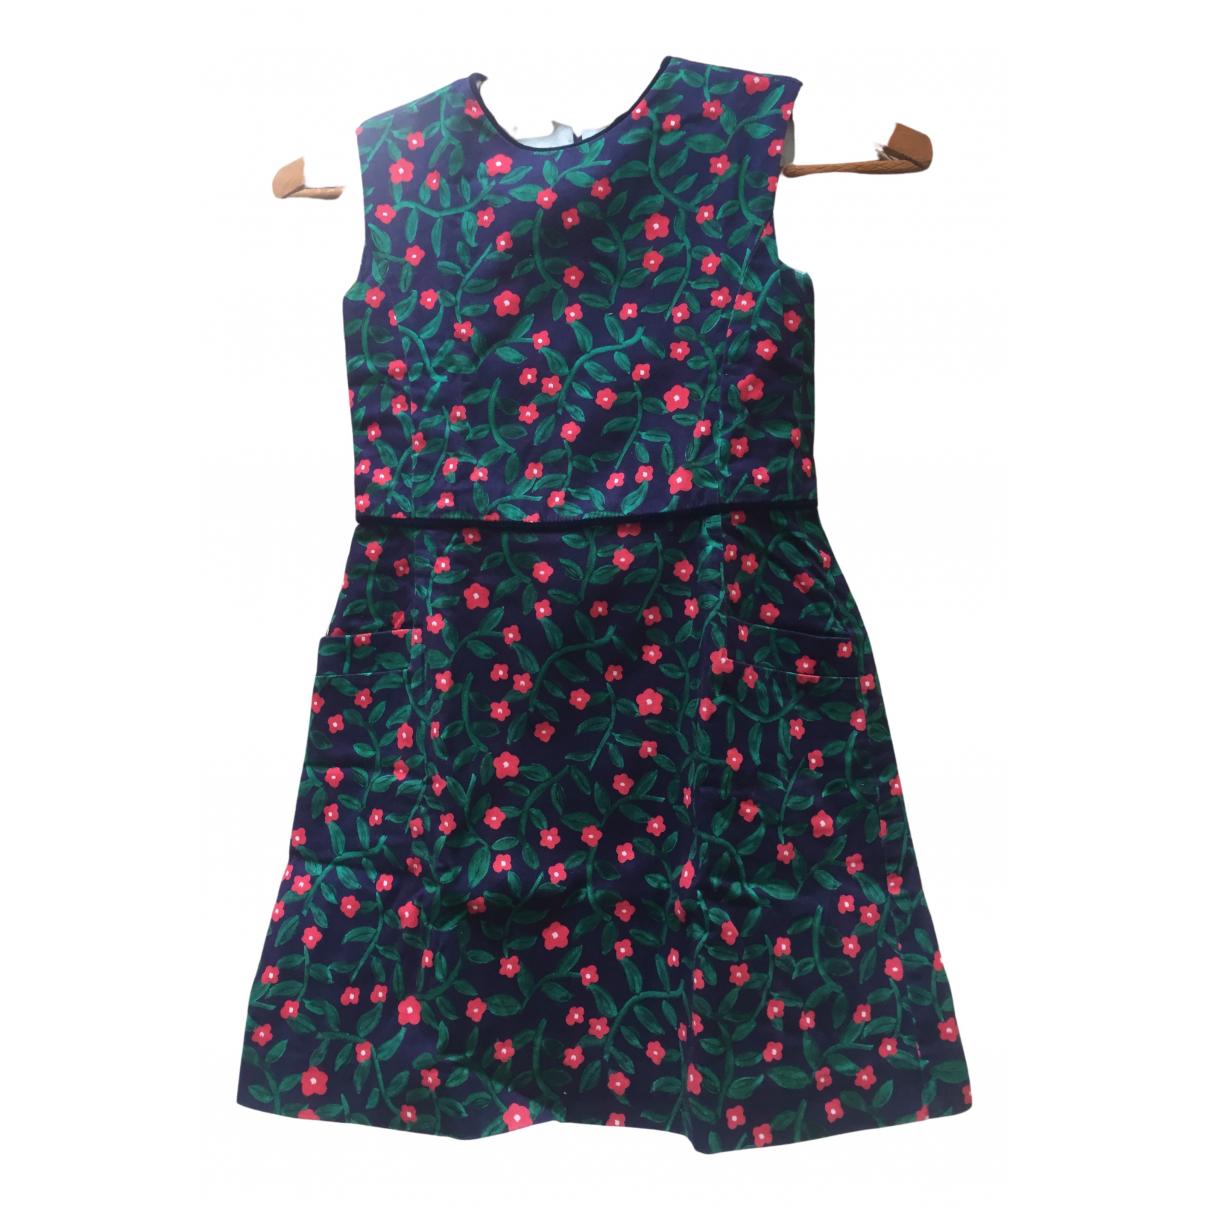 Oscar De La Renta N Blue Cotton dress for Kids 8 years - up to 128cm FR